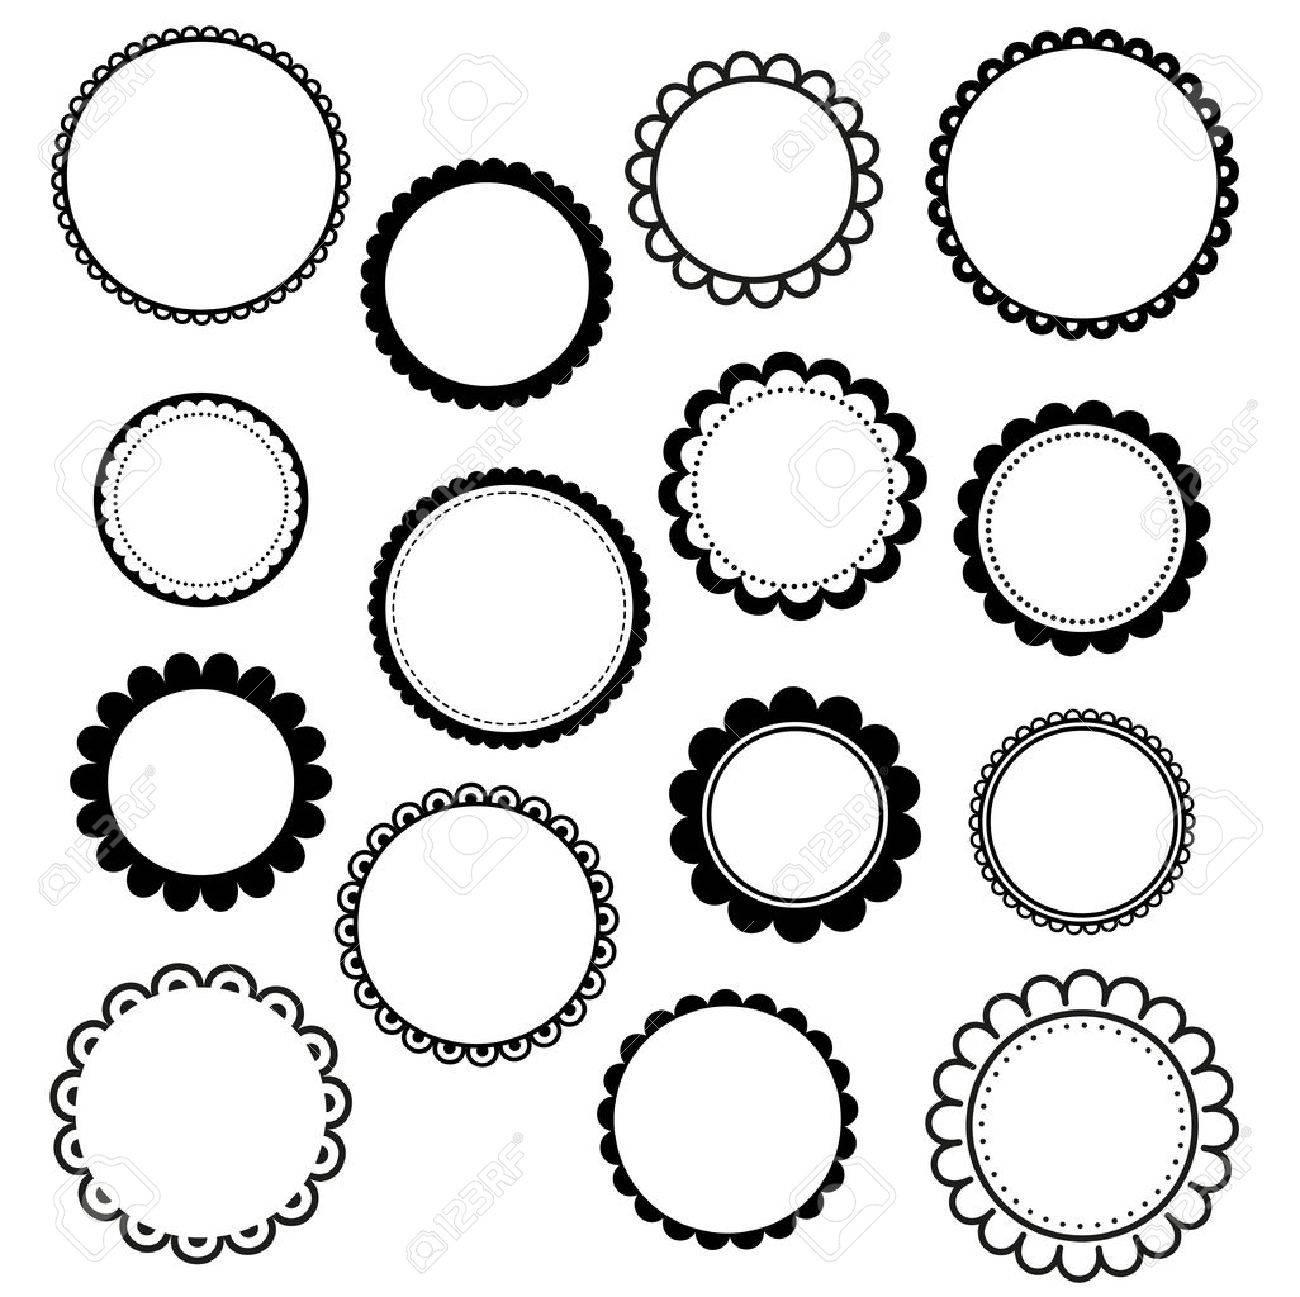 Set of round scalloped frames - 50321455